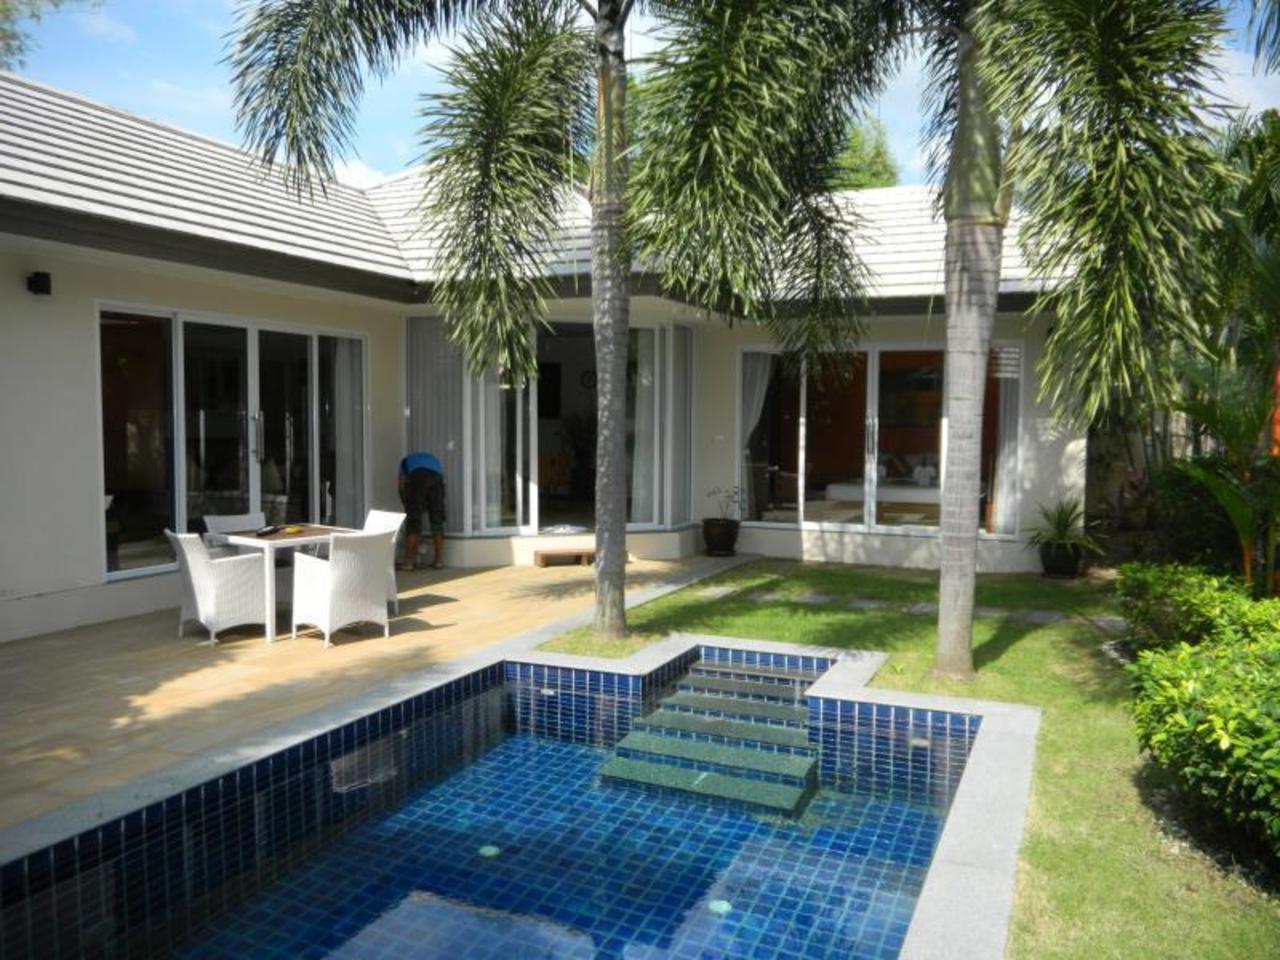 5 Islands Beach Villa Lipa Noi (5 Islands Beach villa Lipa Noi)